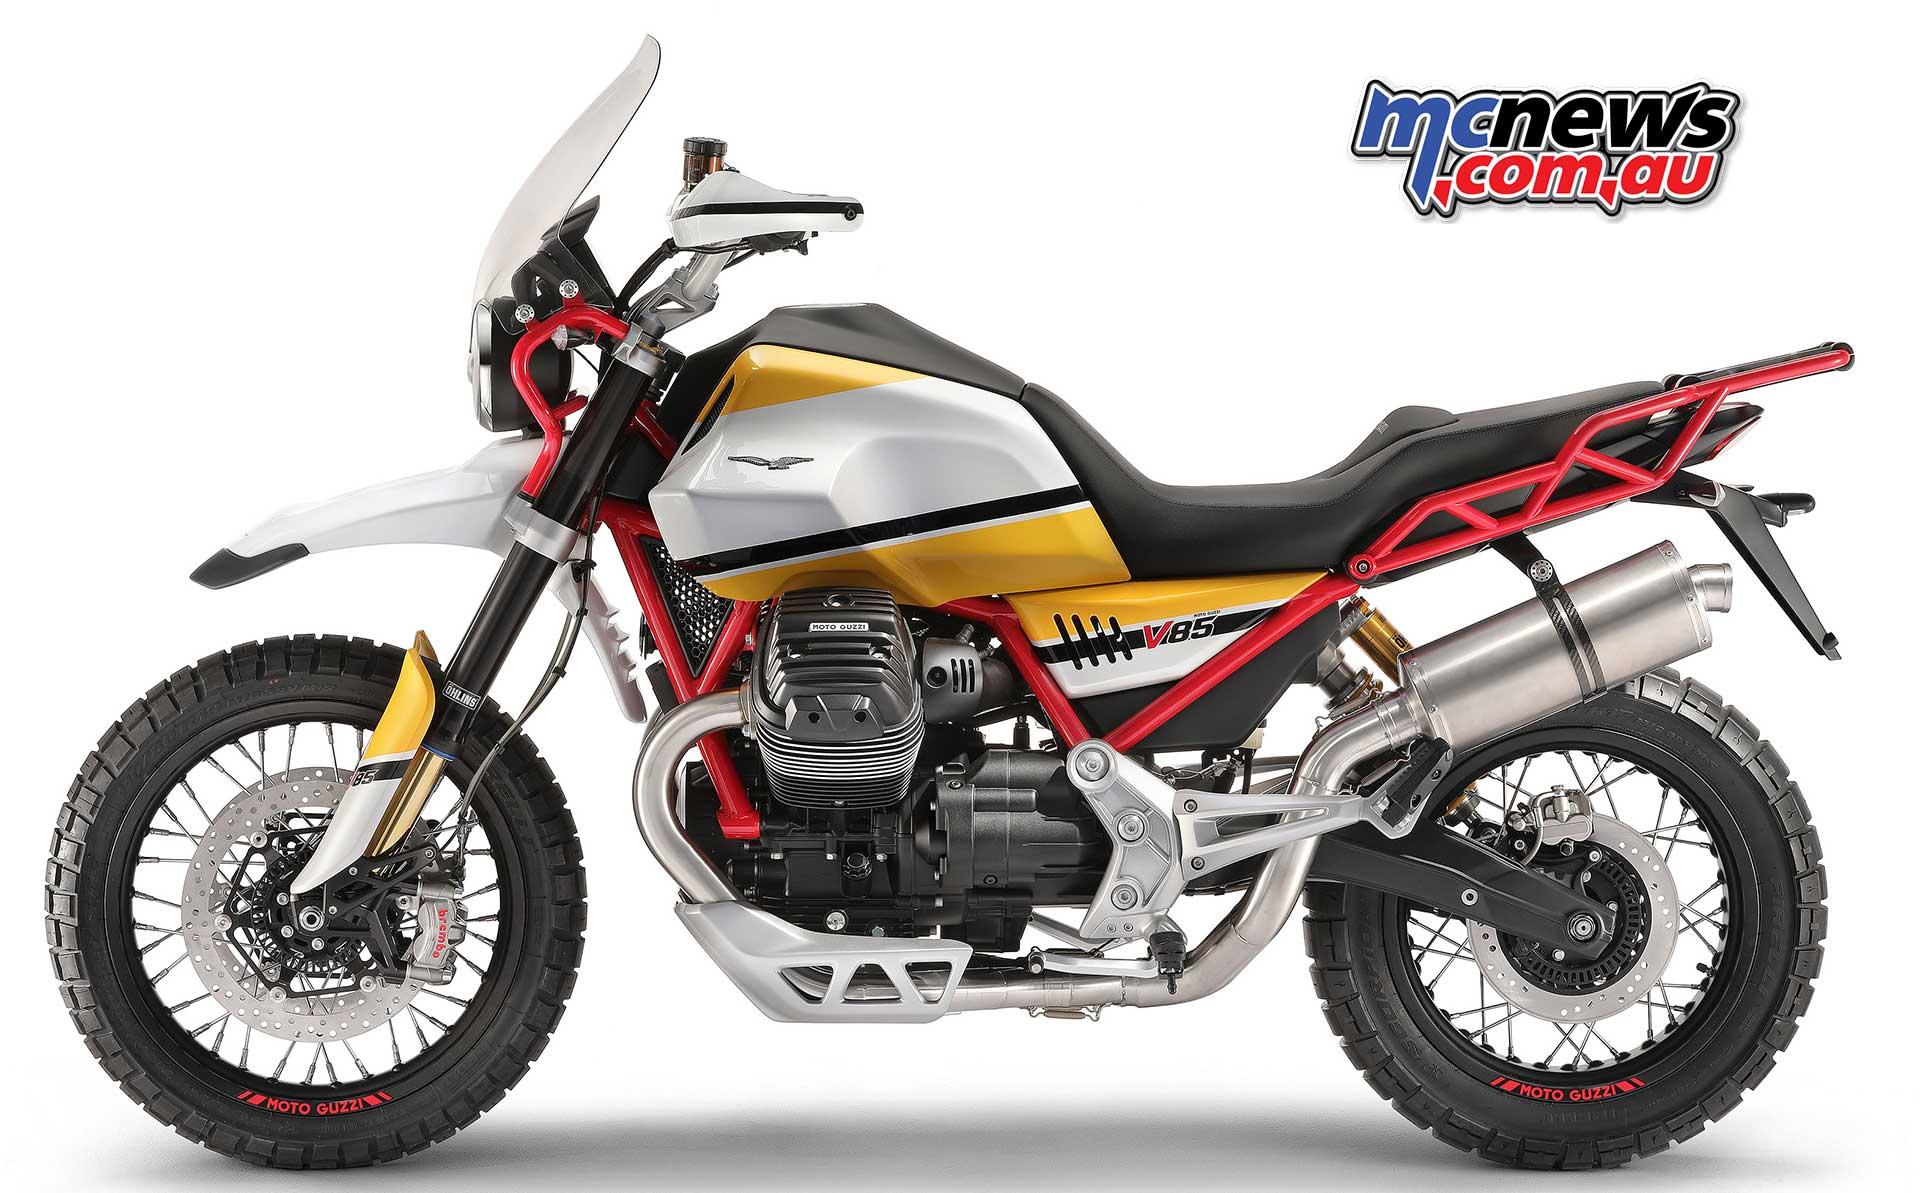 Moto Guzzi New Models